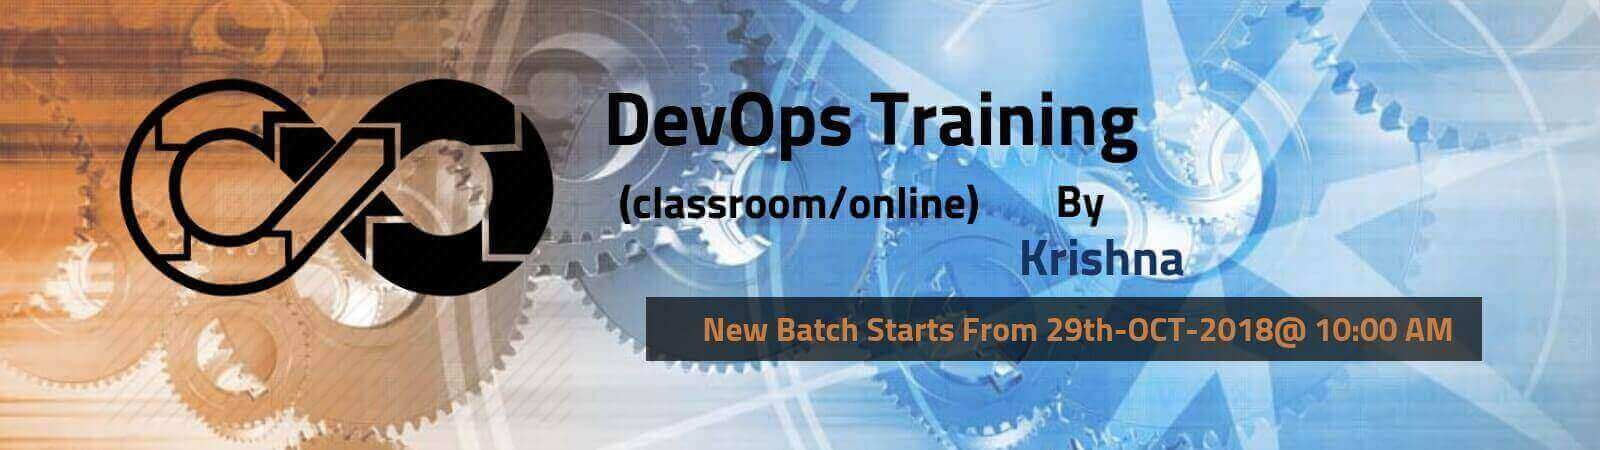 DevOps New Batch 25th-OCT-2018 Banner